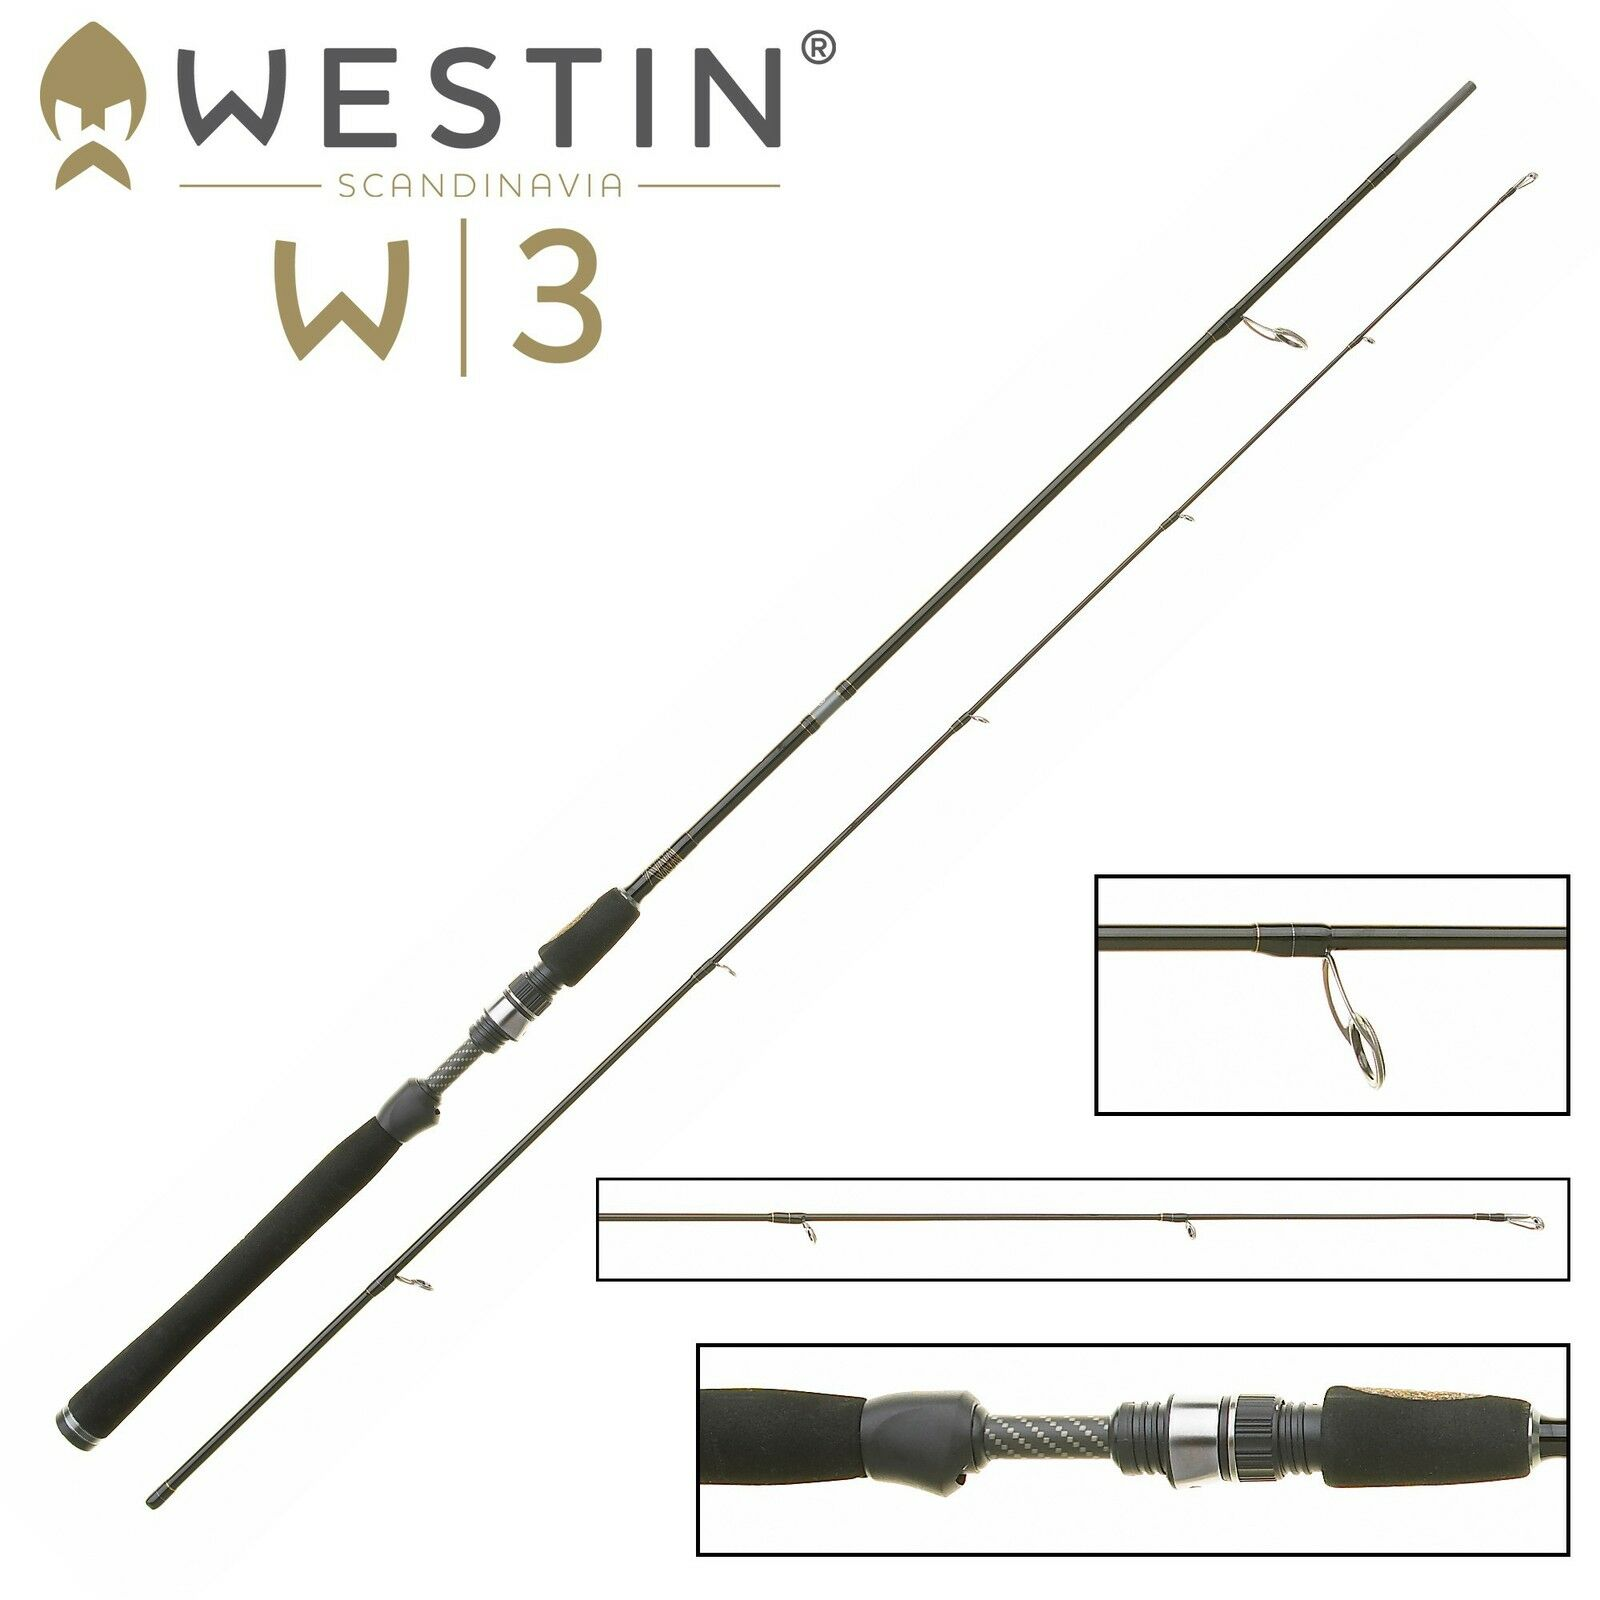 Westin W3 Grünical Grünical Grünical Jigging M Spinnrute 185cm 14-28g - Grünikalrute für Zander  | Ausgezeichnetes Handwerk  1c6408